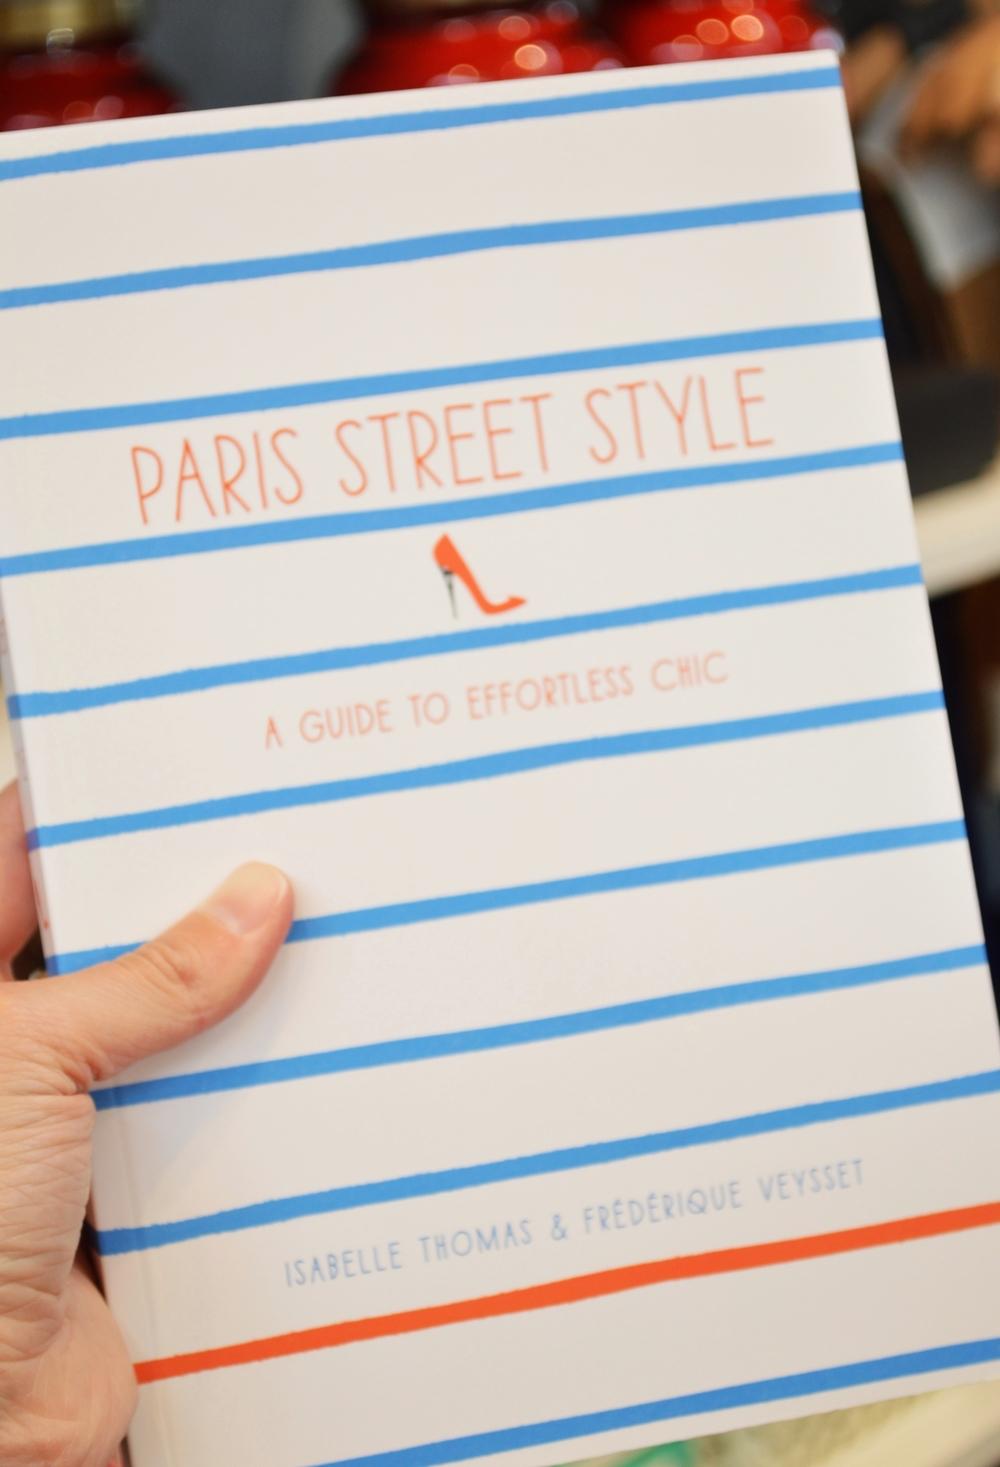 LaurenSchwaiger-Life-Style-Blog-Paris-Street-Style.jpg